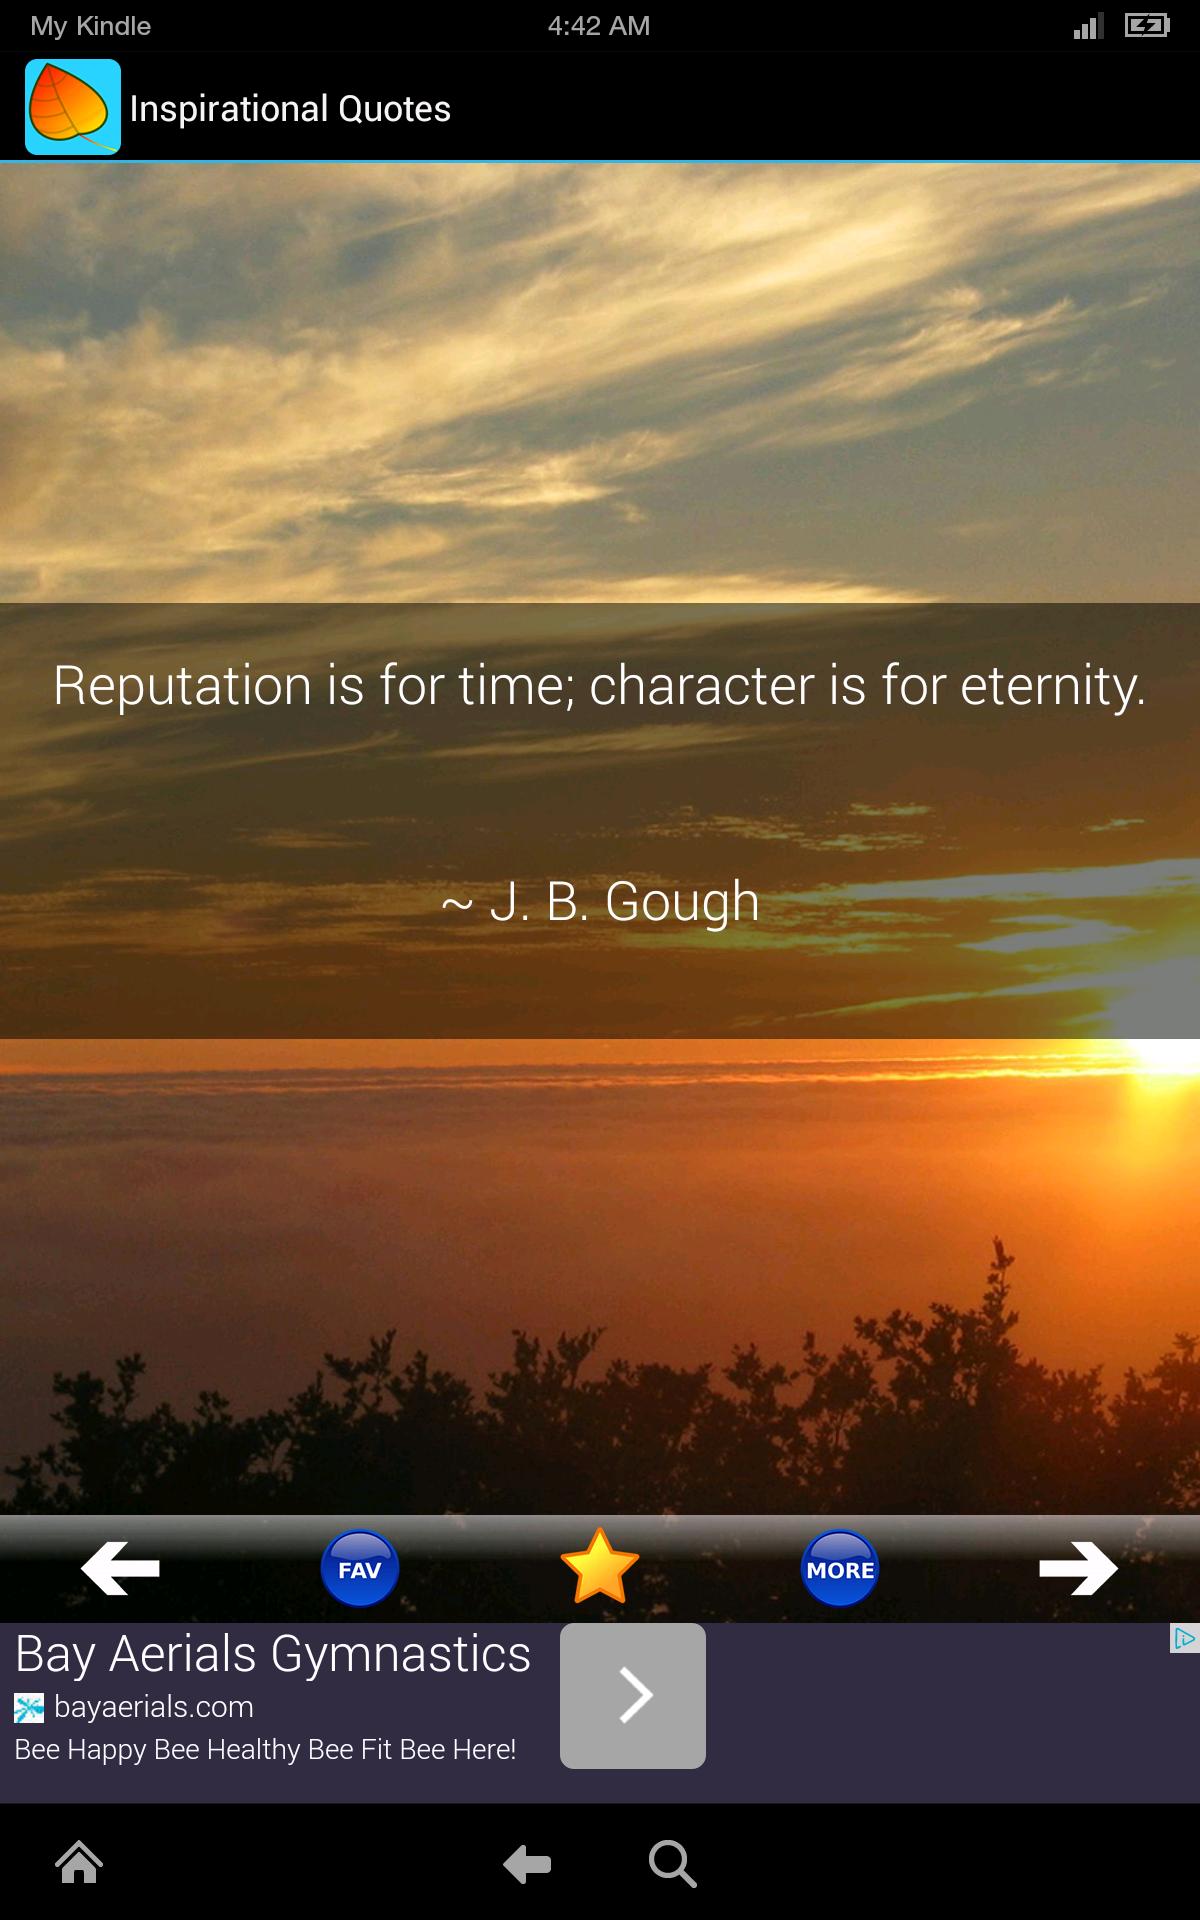 Amazon.com: Inspirational & Motivational Quotes FREE